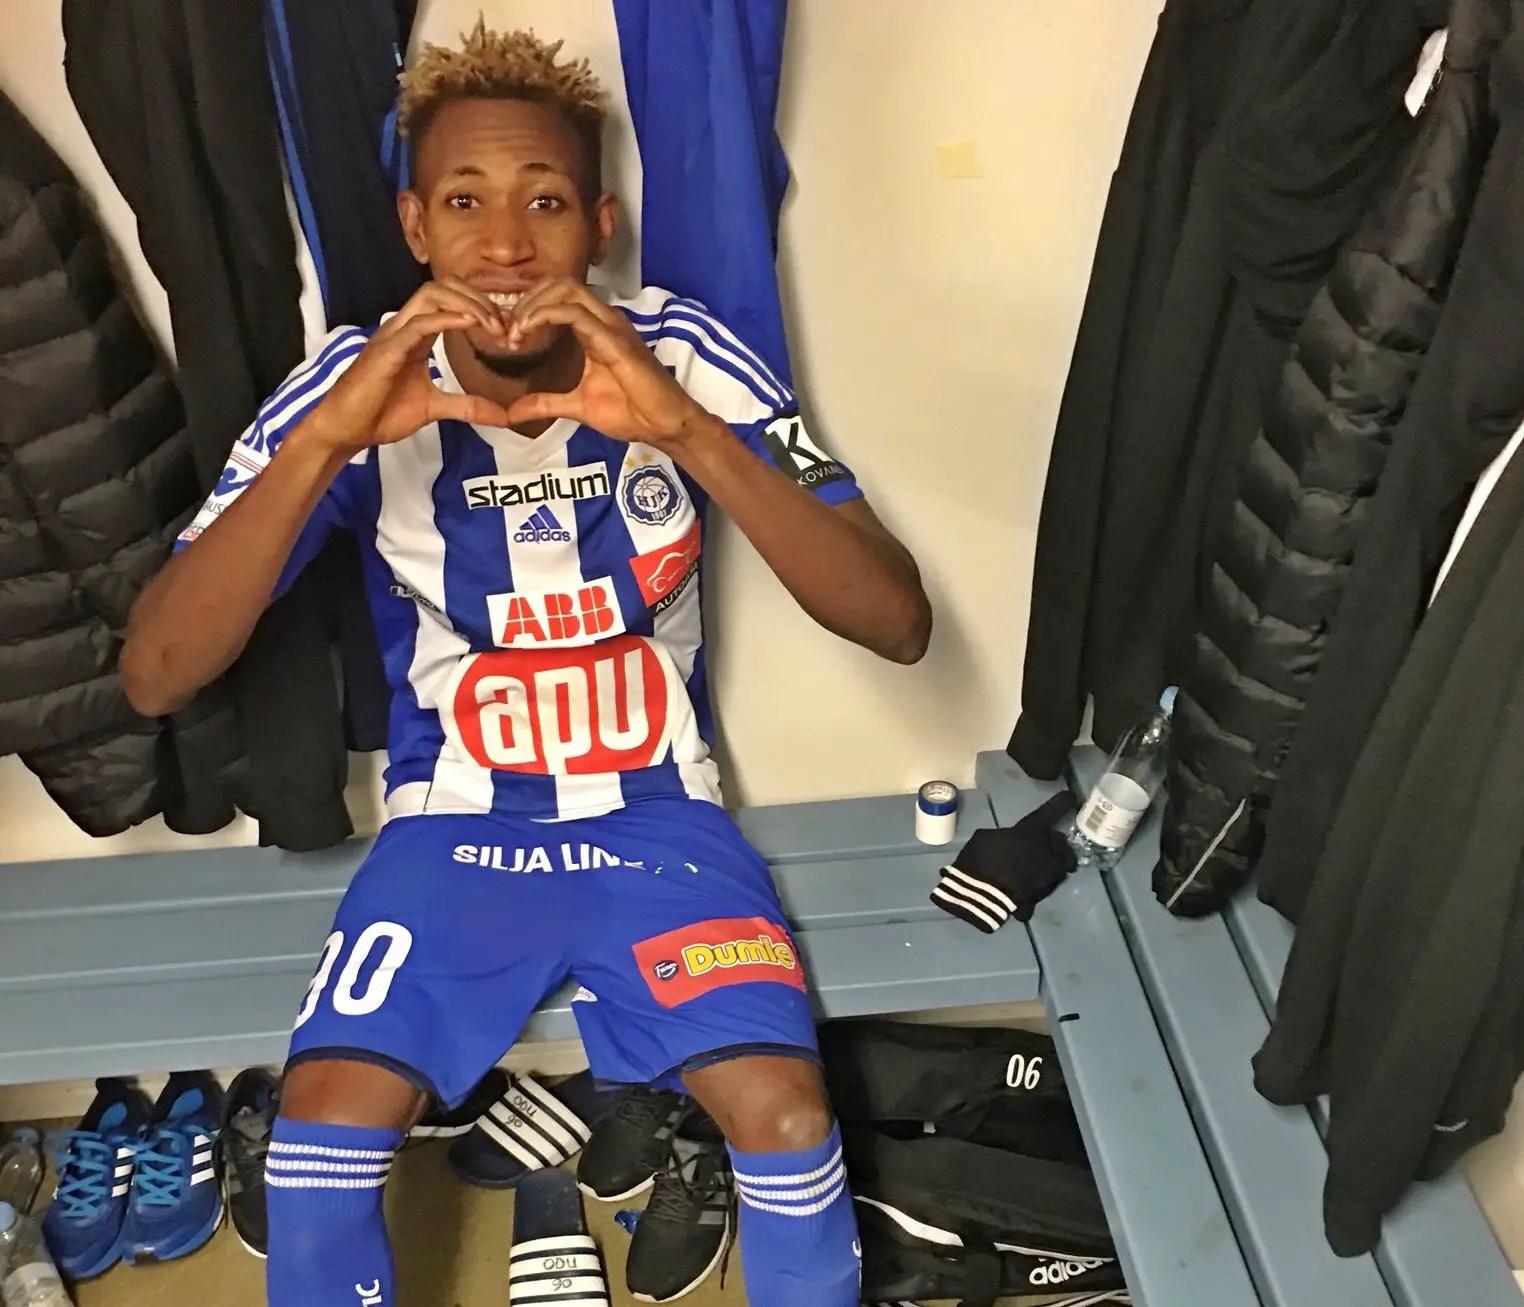 Turkish Club Gozetepe Lead Chase For Oduamadi Loan Signing From Milan